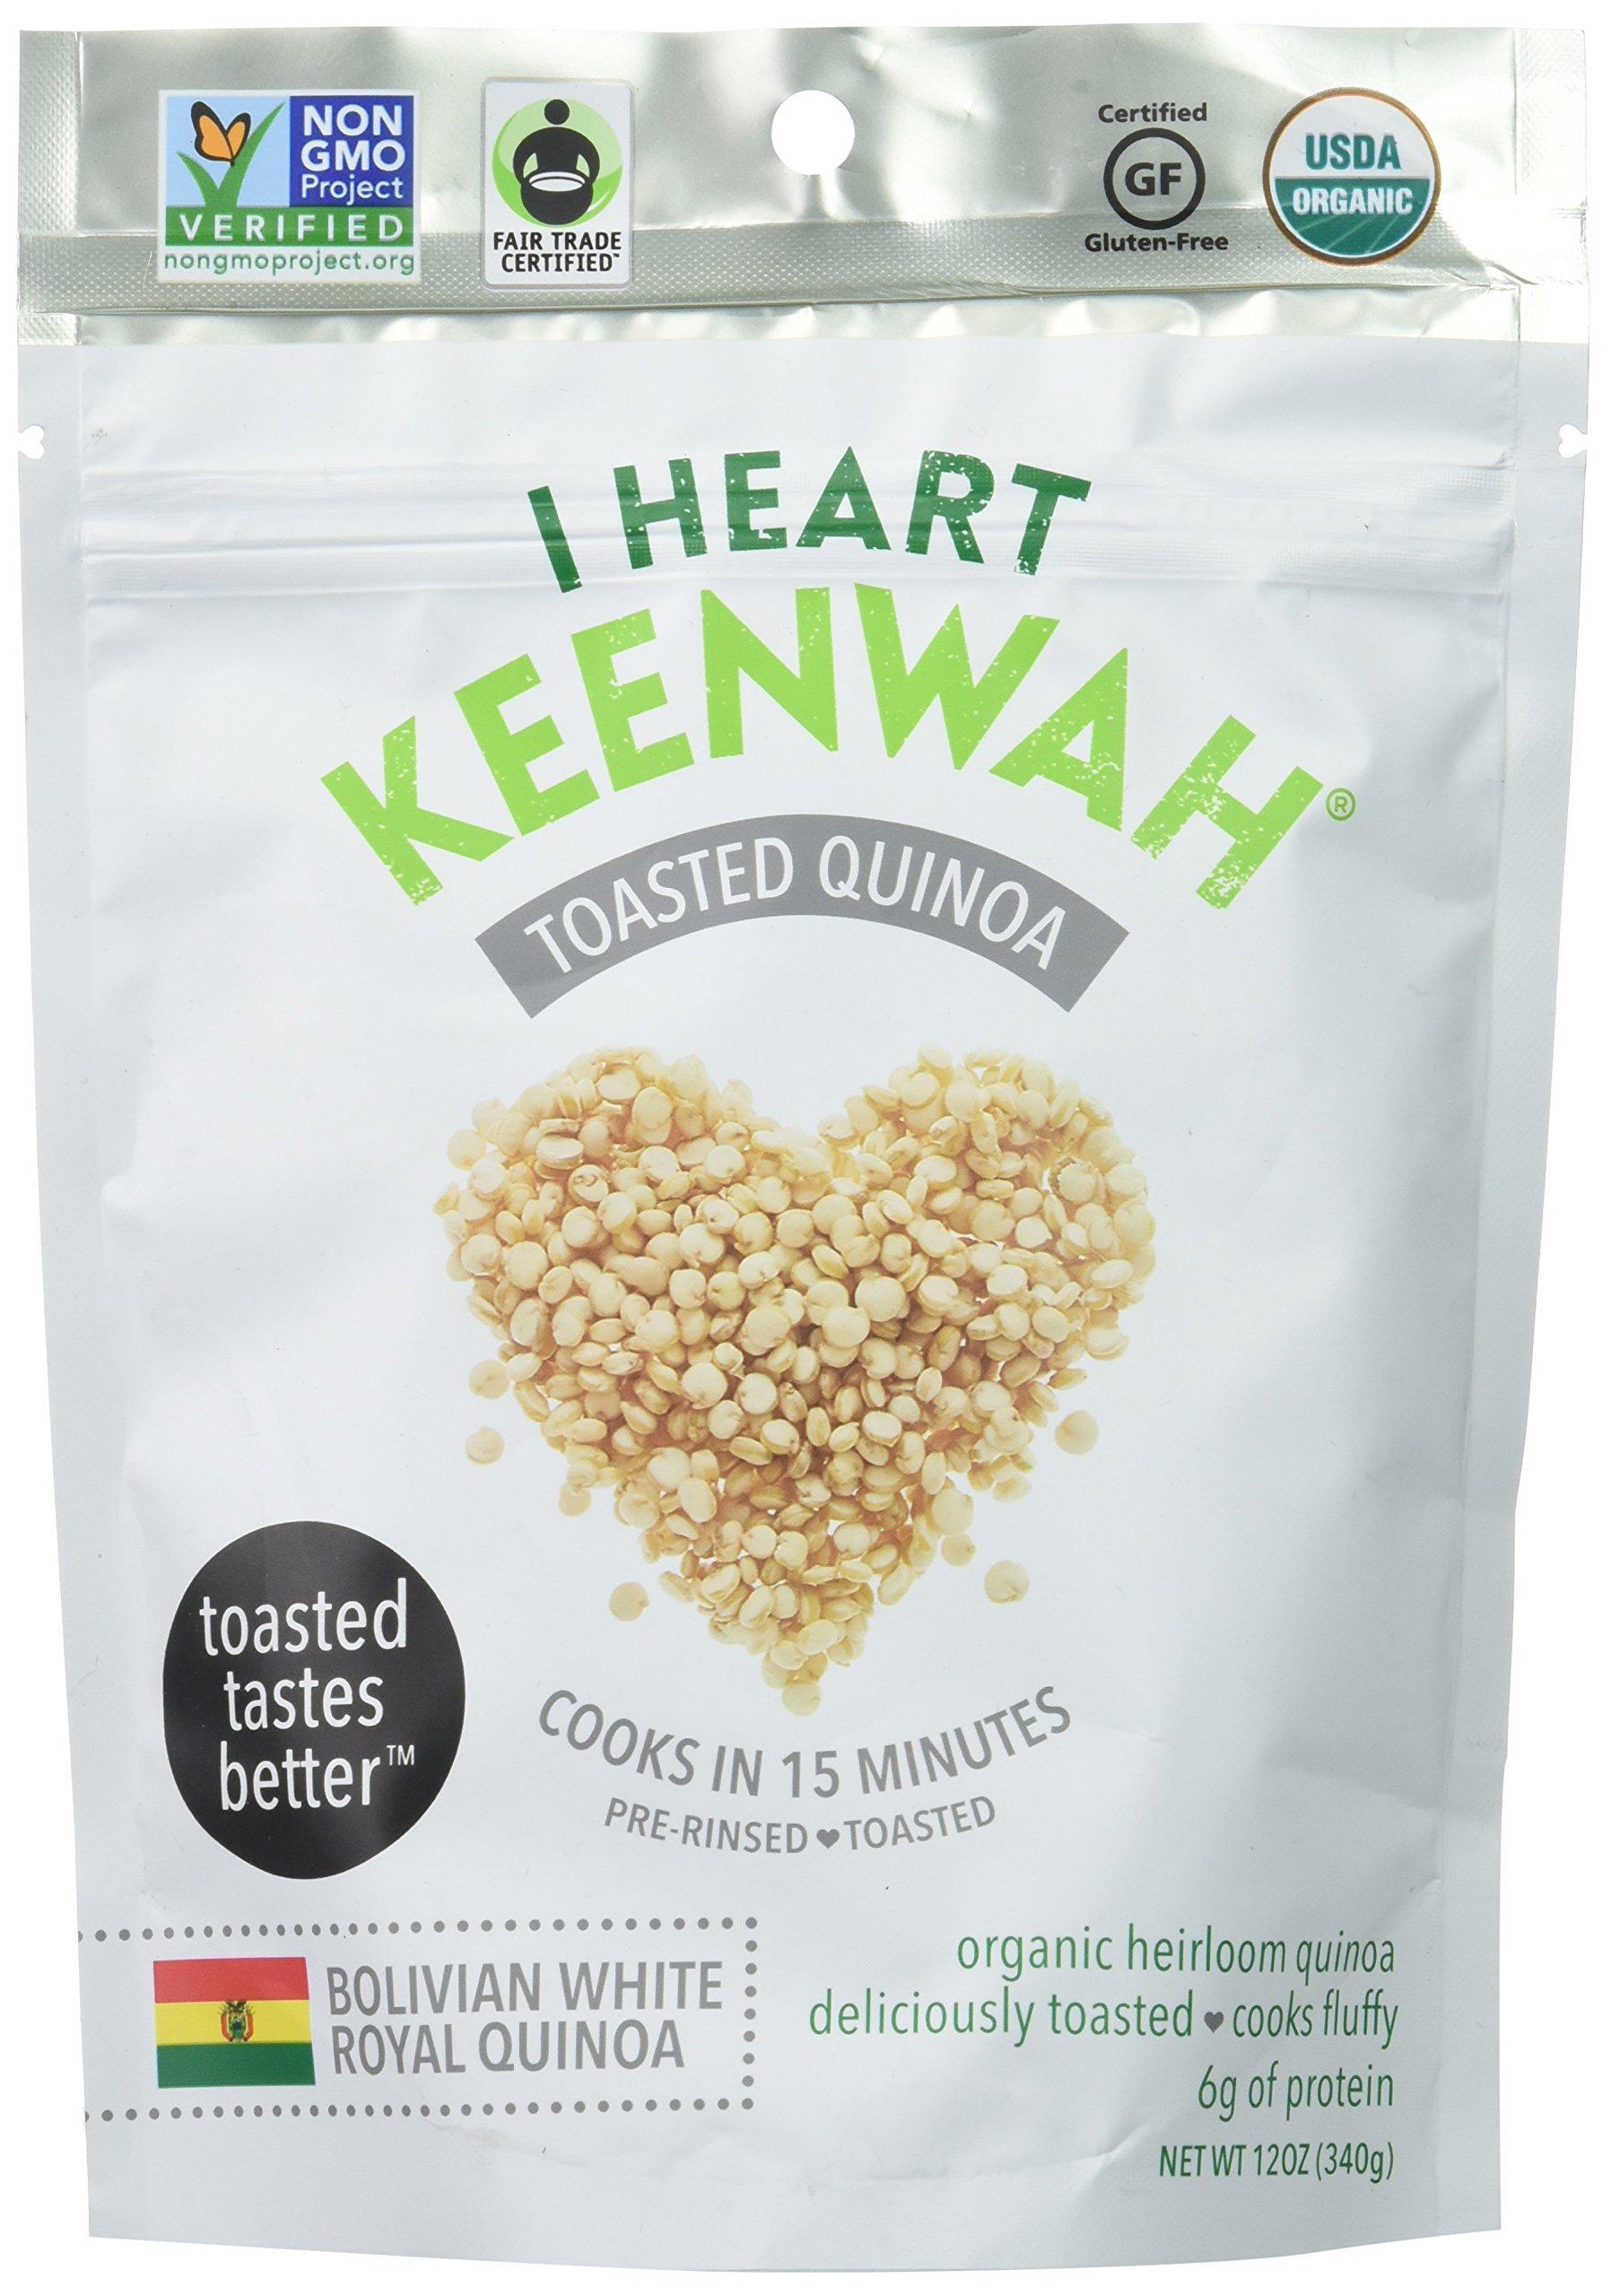 I Heart Keenwah Toasted Quinoa, White, Organic, Whole Grain, Gluten-Free (12oz Bag)